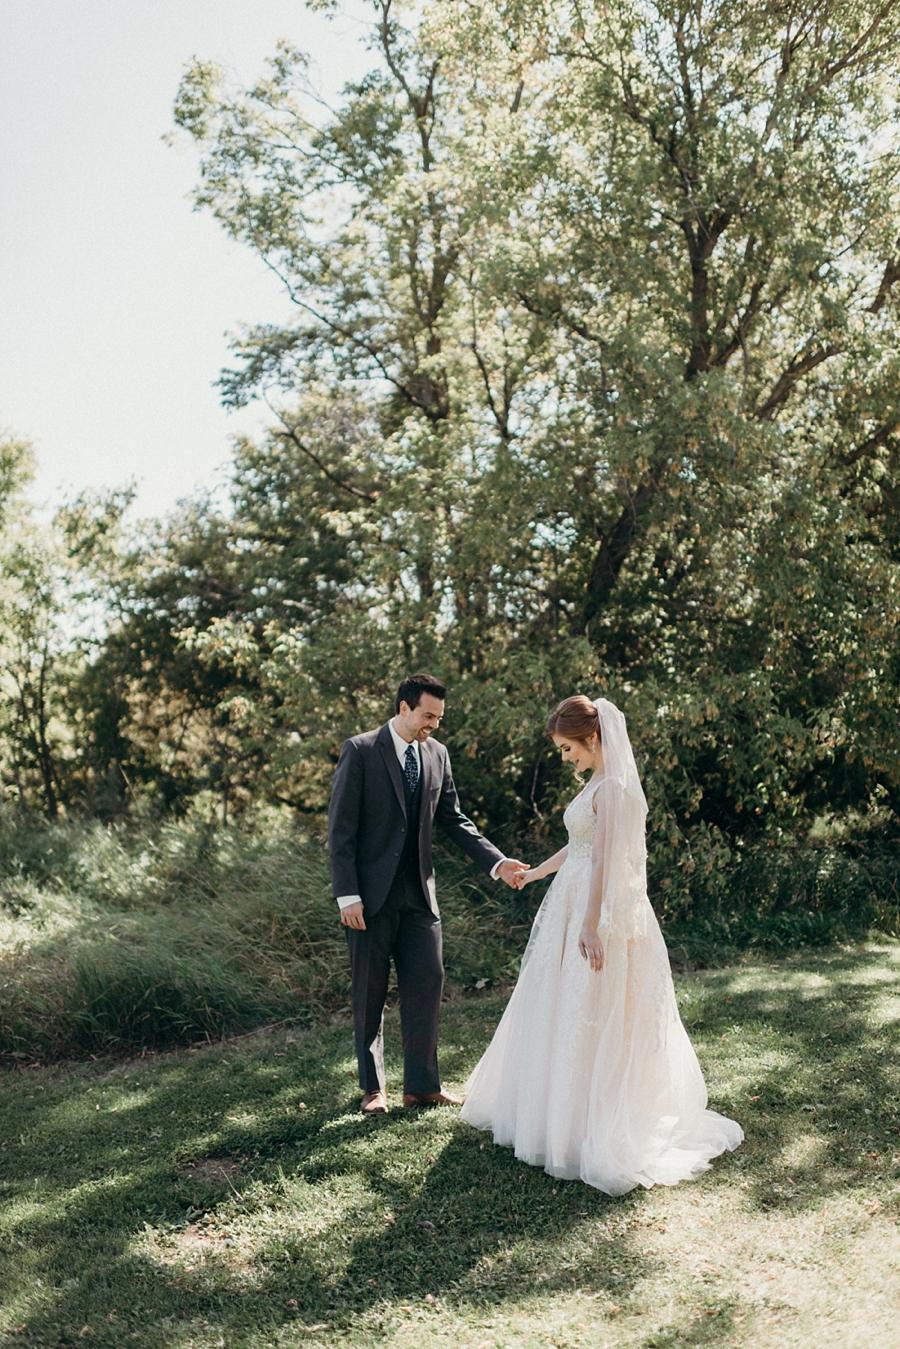 kaihla_tonai_intimate_wedding_elopement_photographer_7280.jpg